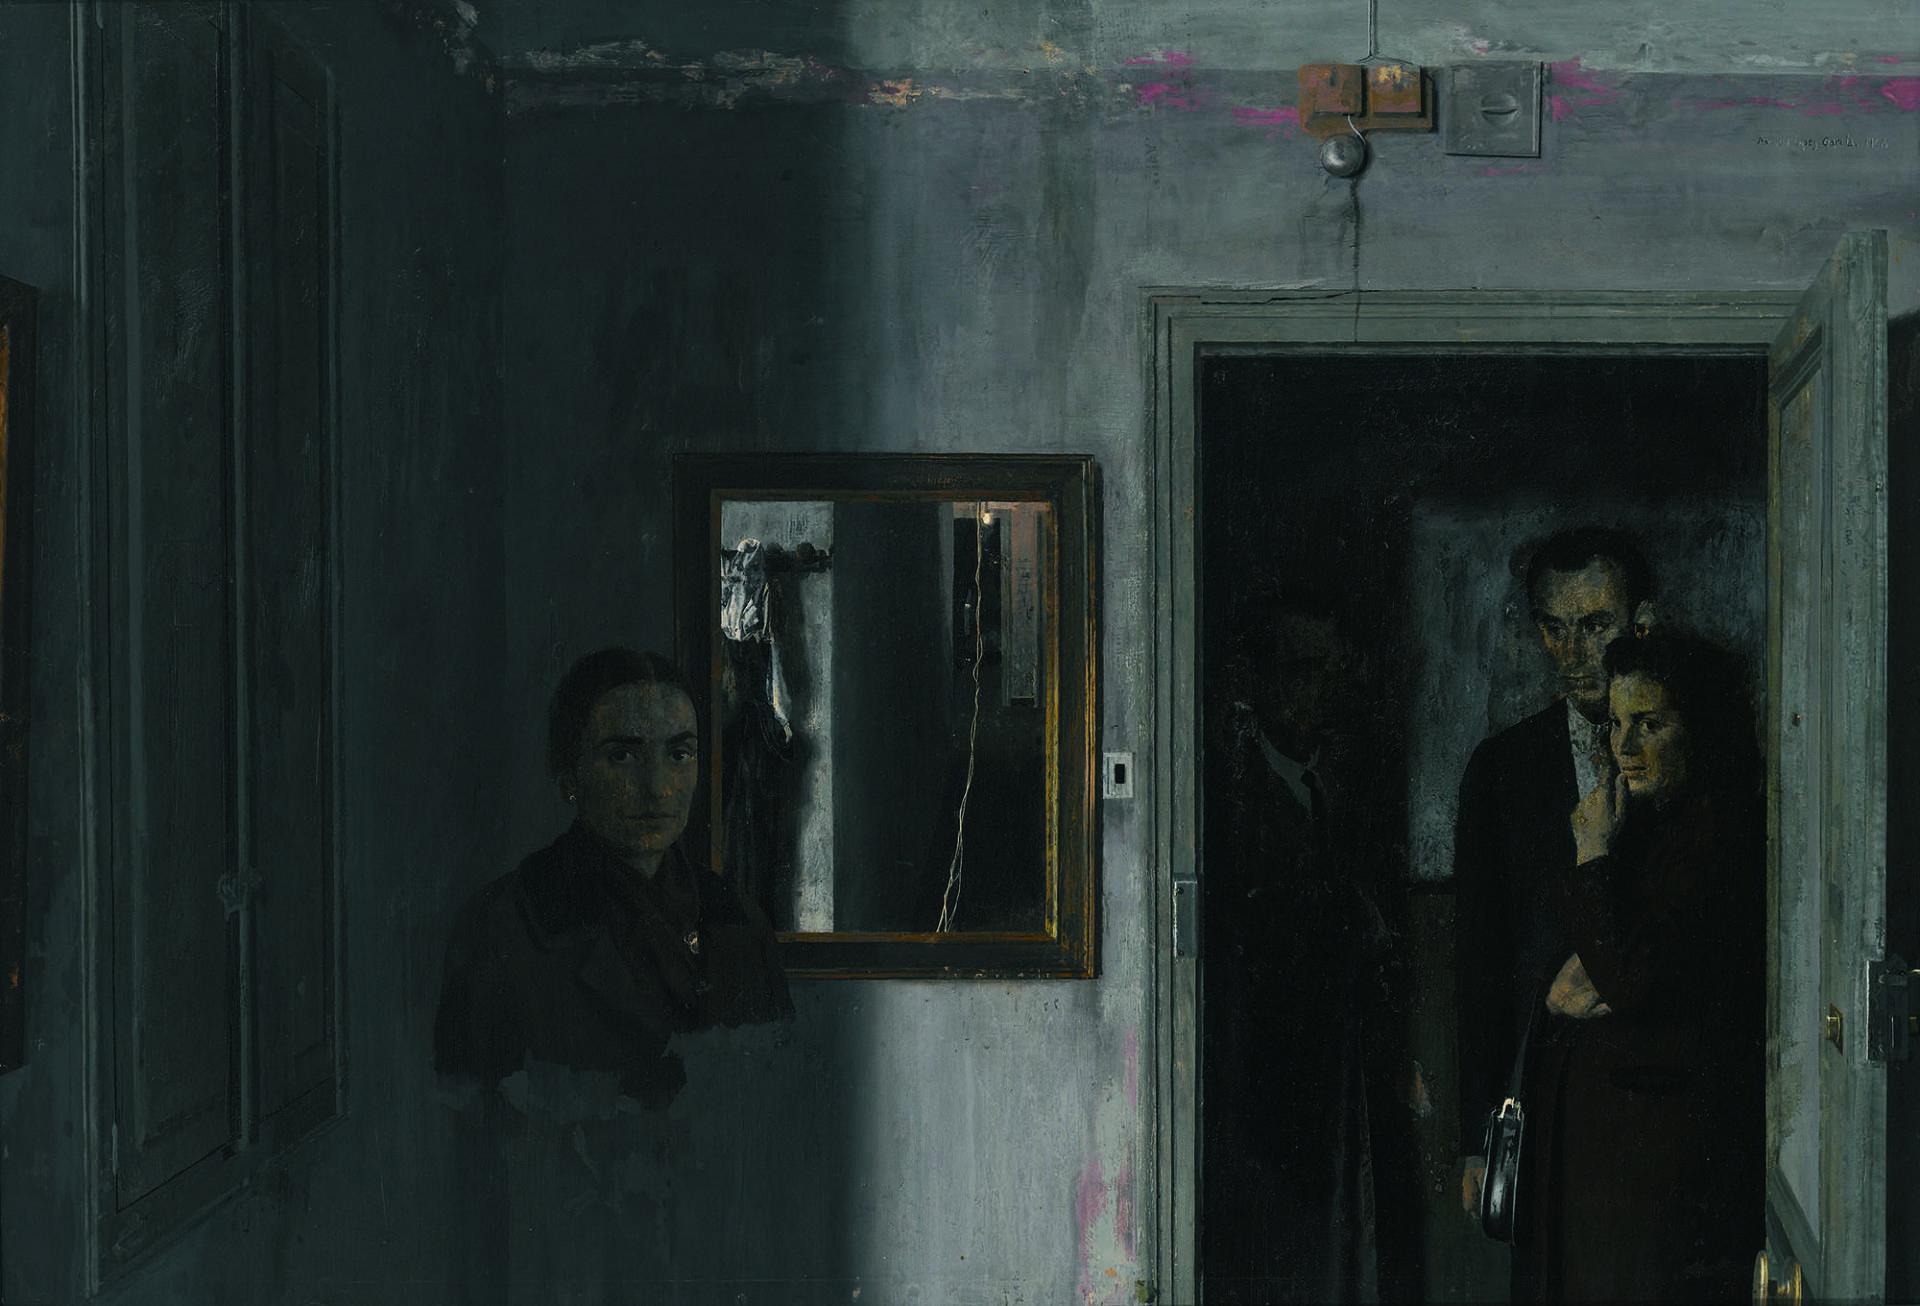 Antonio López, 'Figures in a house'